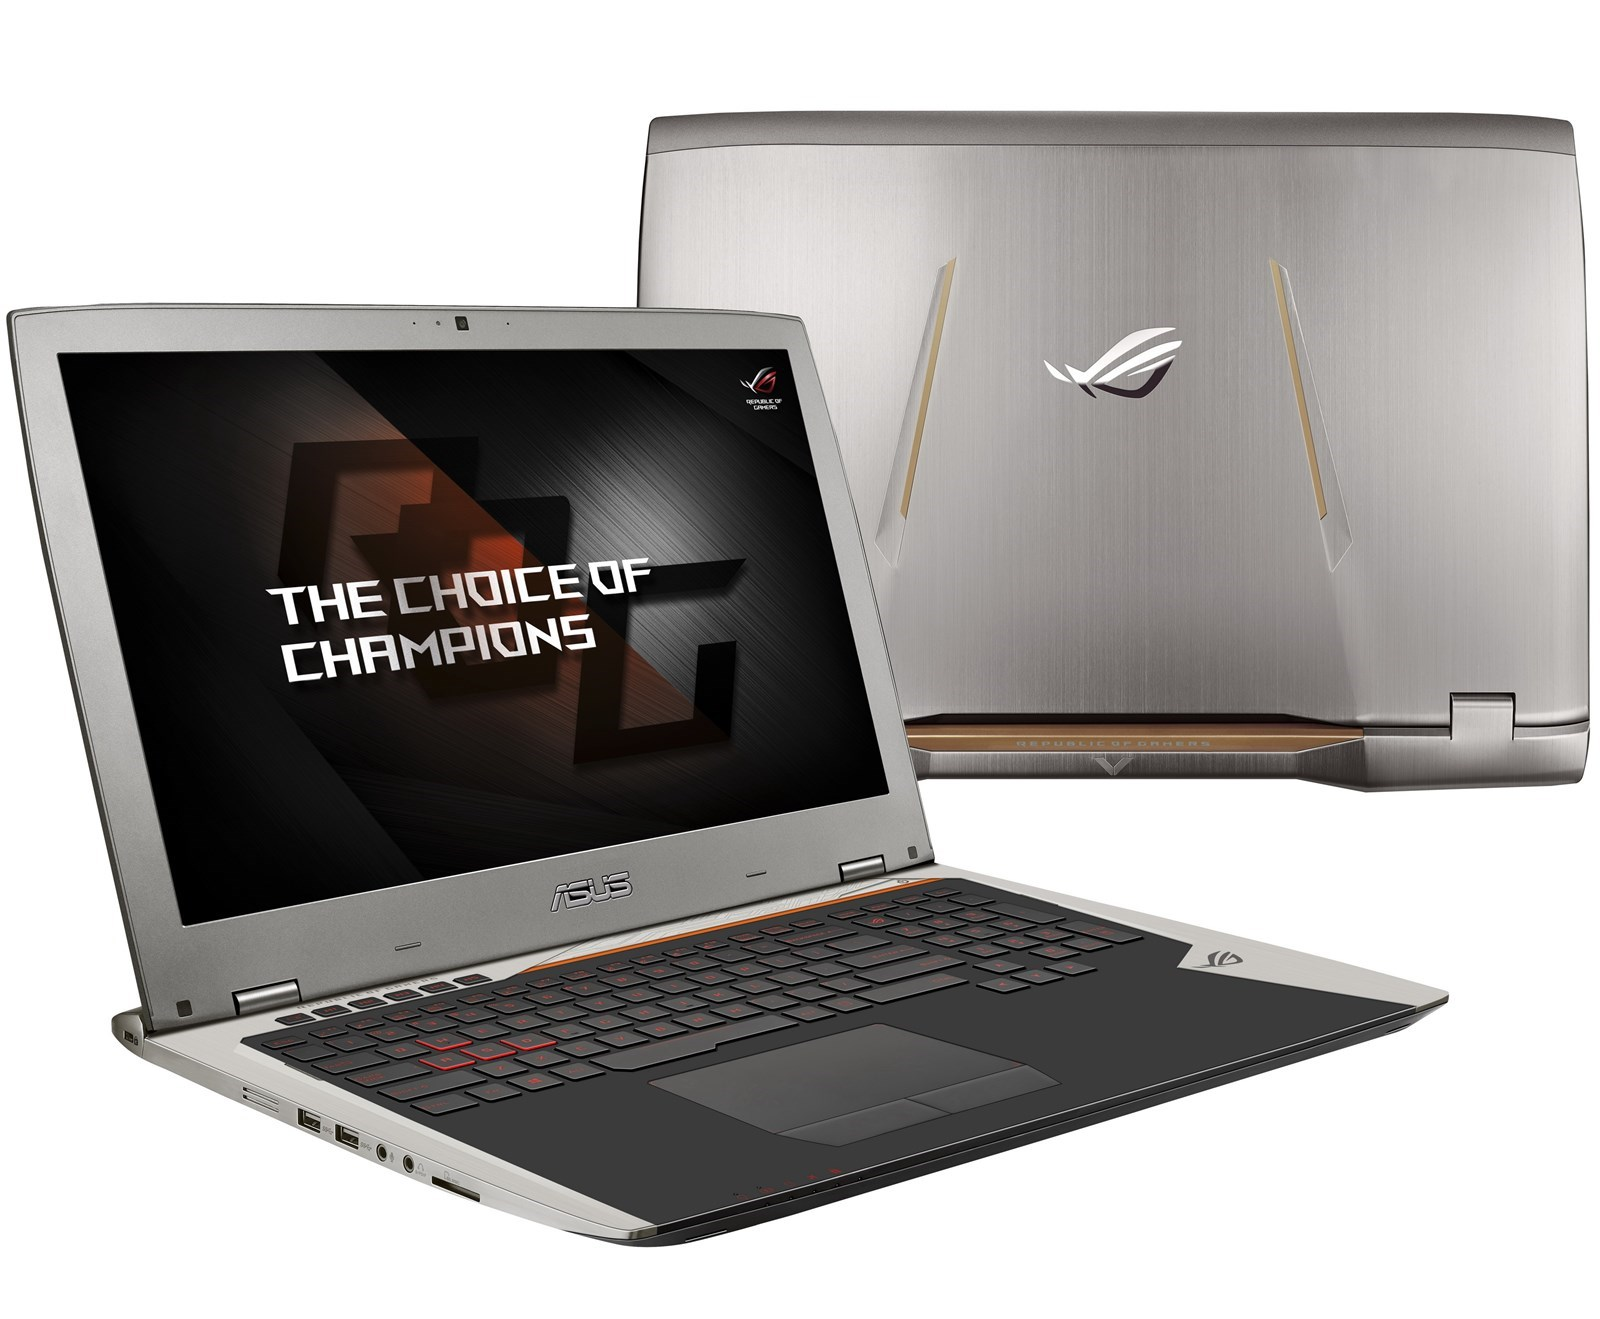 Cross-bord:- ASUS ROG G701VI-XB78K 17.3 inch Gaming Laptop (Intel Core i7-6820HK, 64GB SDRAM, 1TB SSD, Windows 10) low price